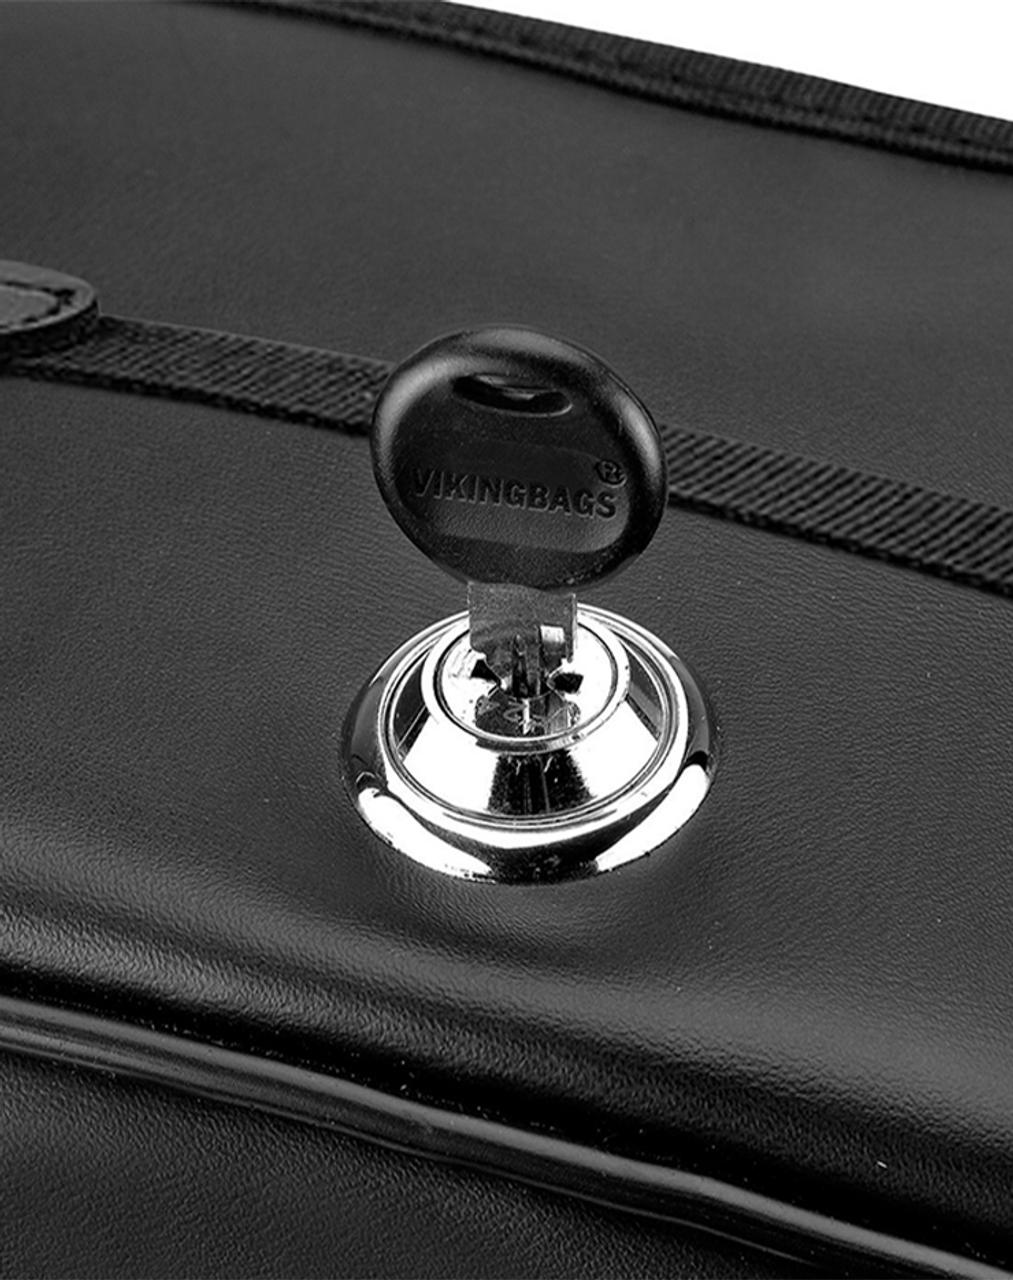 Suzuki Boulevard C90,VL1500, Intruder Ultimate Shape Large Bags Key Lockable View